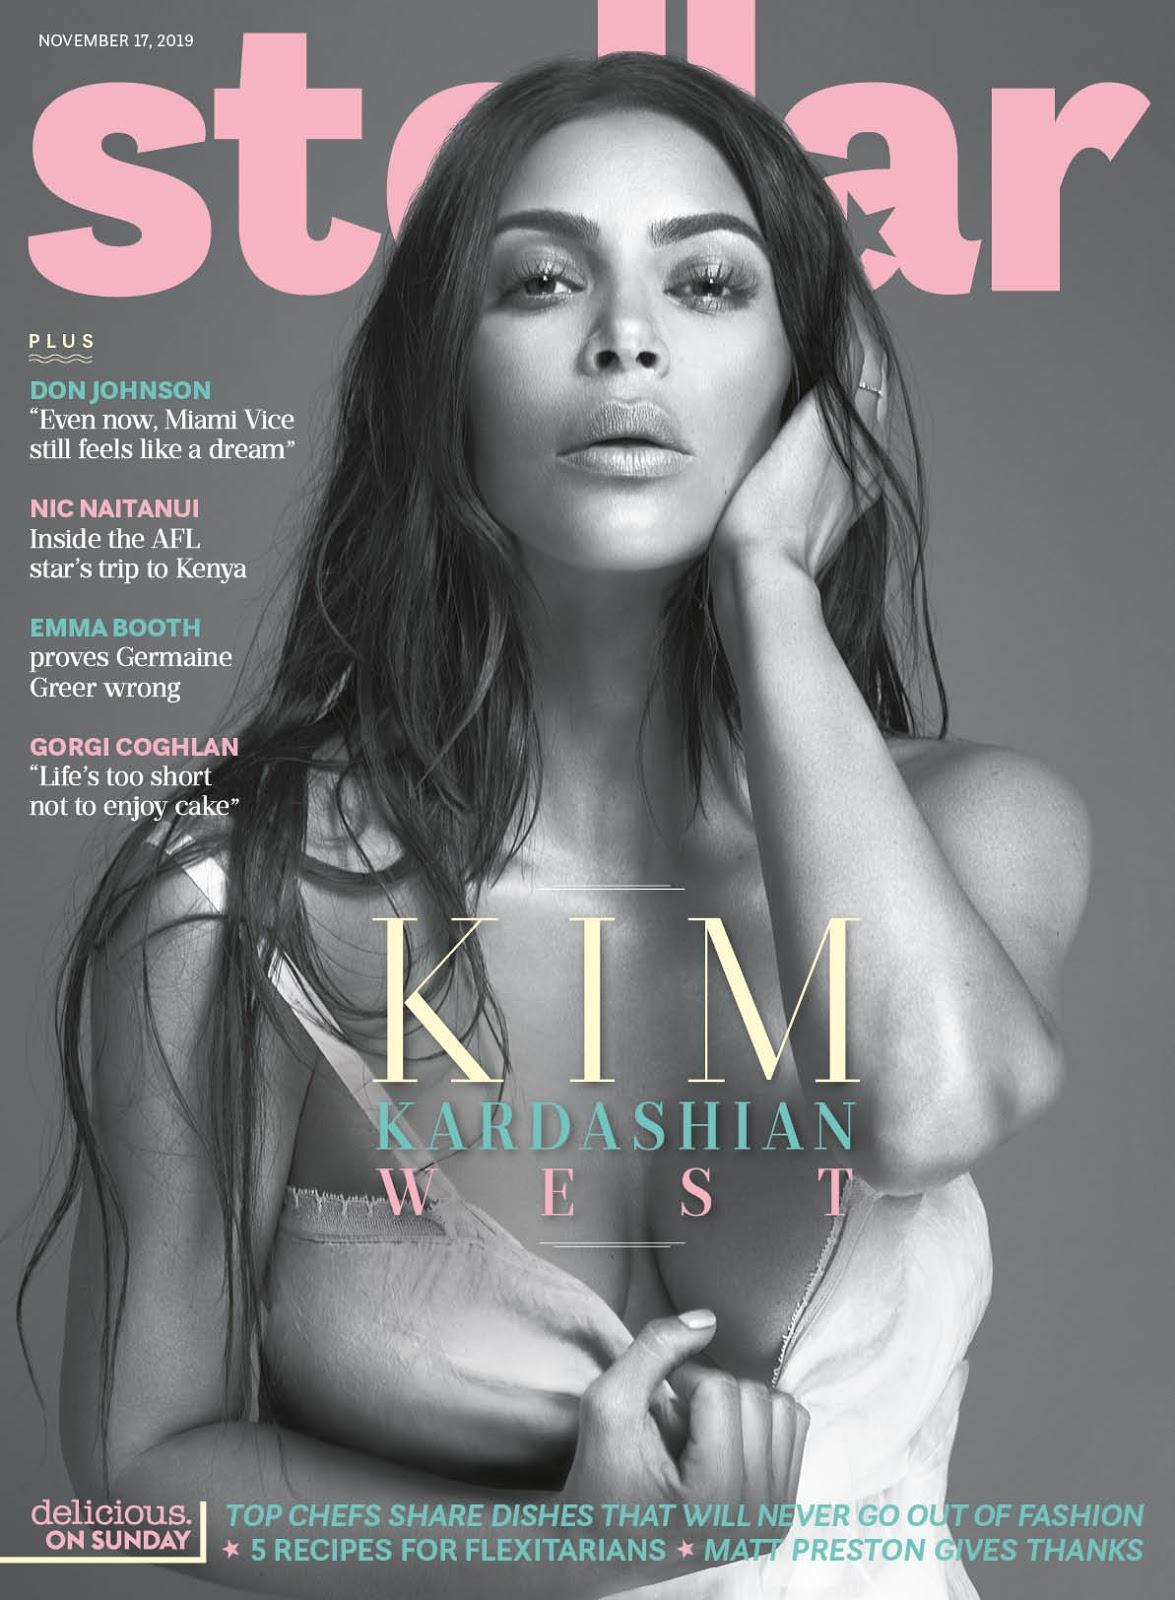 Kim Kardashian stars on the cover of Sunday's Stellar Magazine